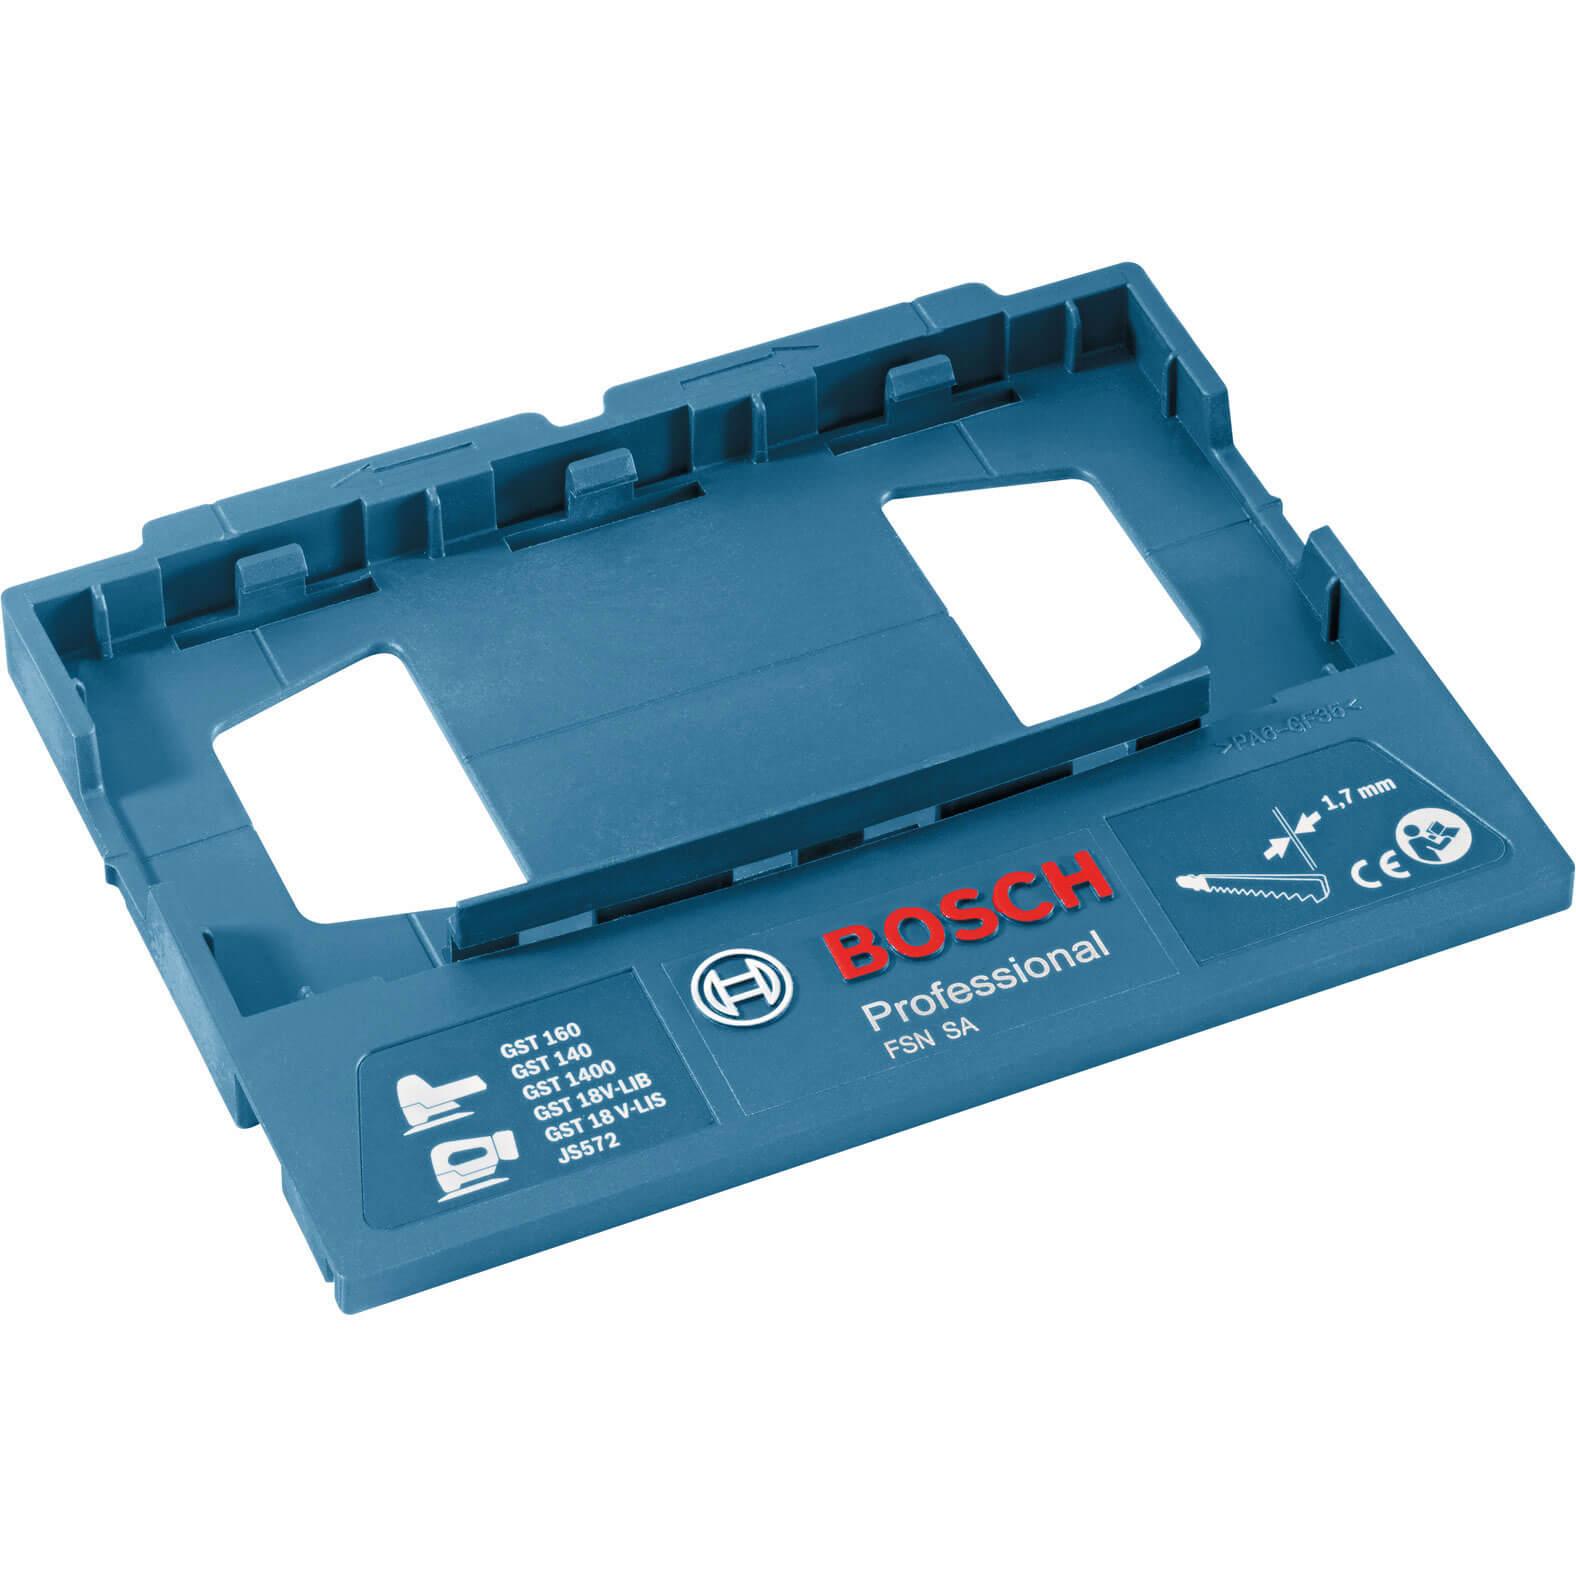 adaptor plate | eBay